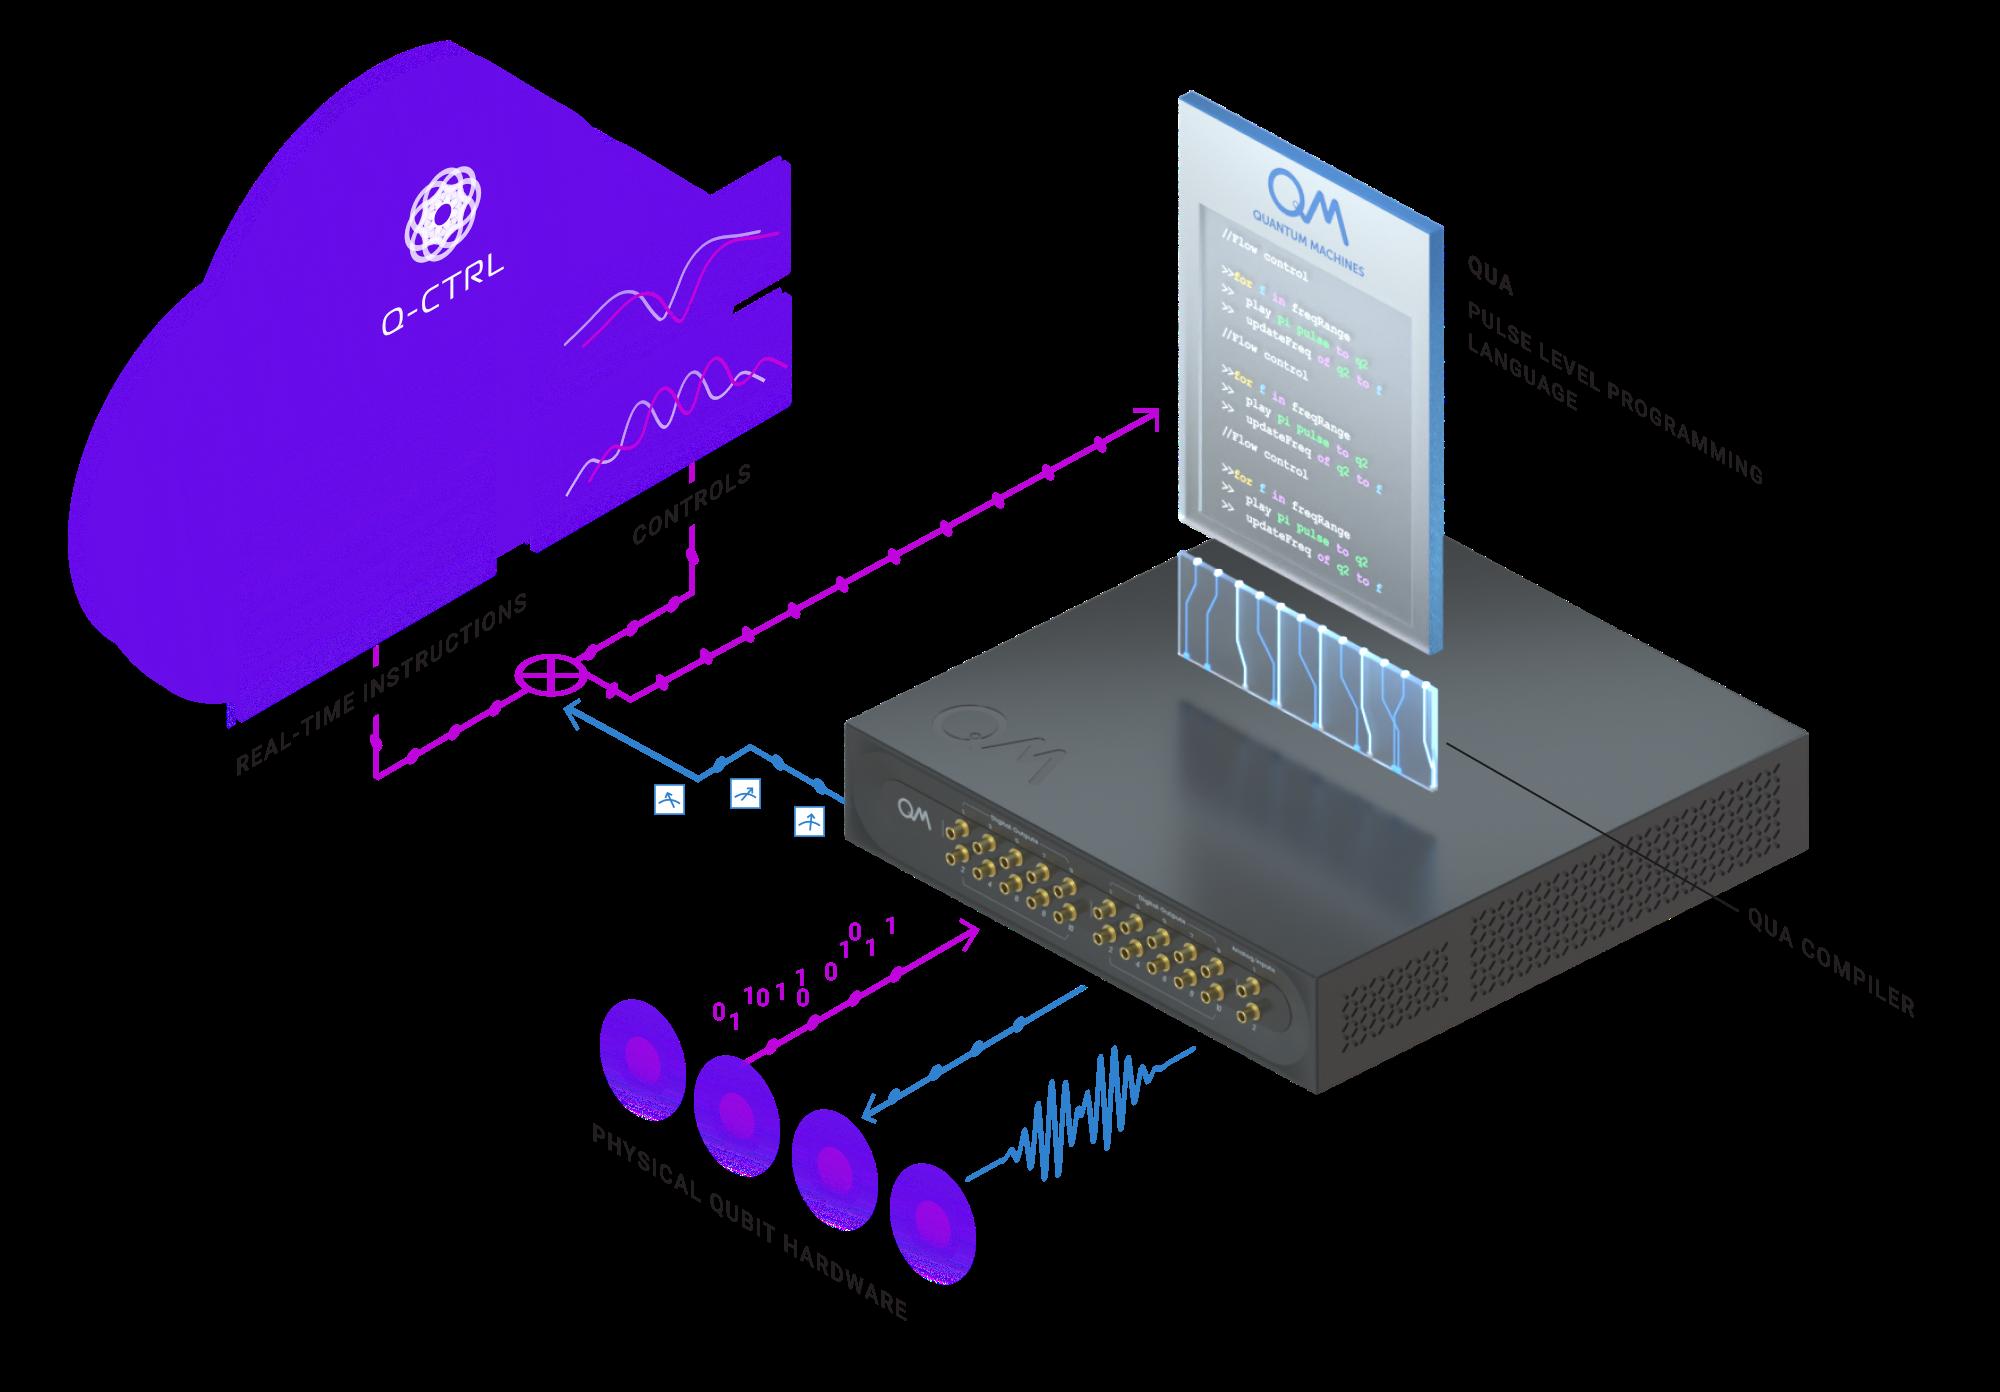 Q Ctrl And Quantum Machines Team Up To Accelerate Quantum Computing Internet Technology News